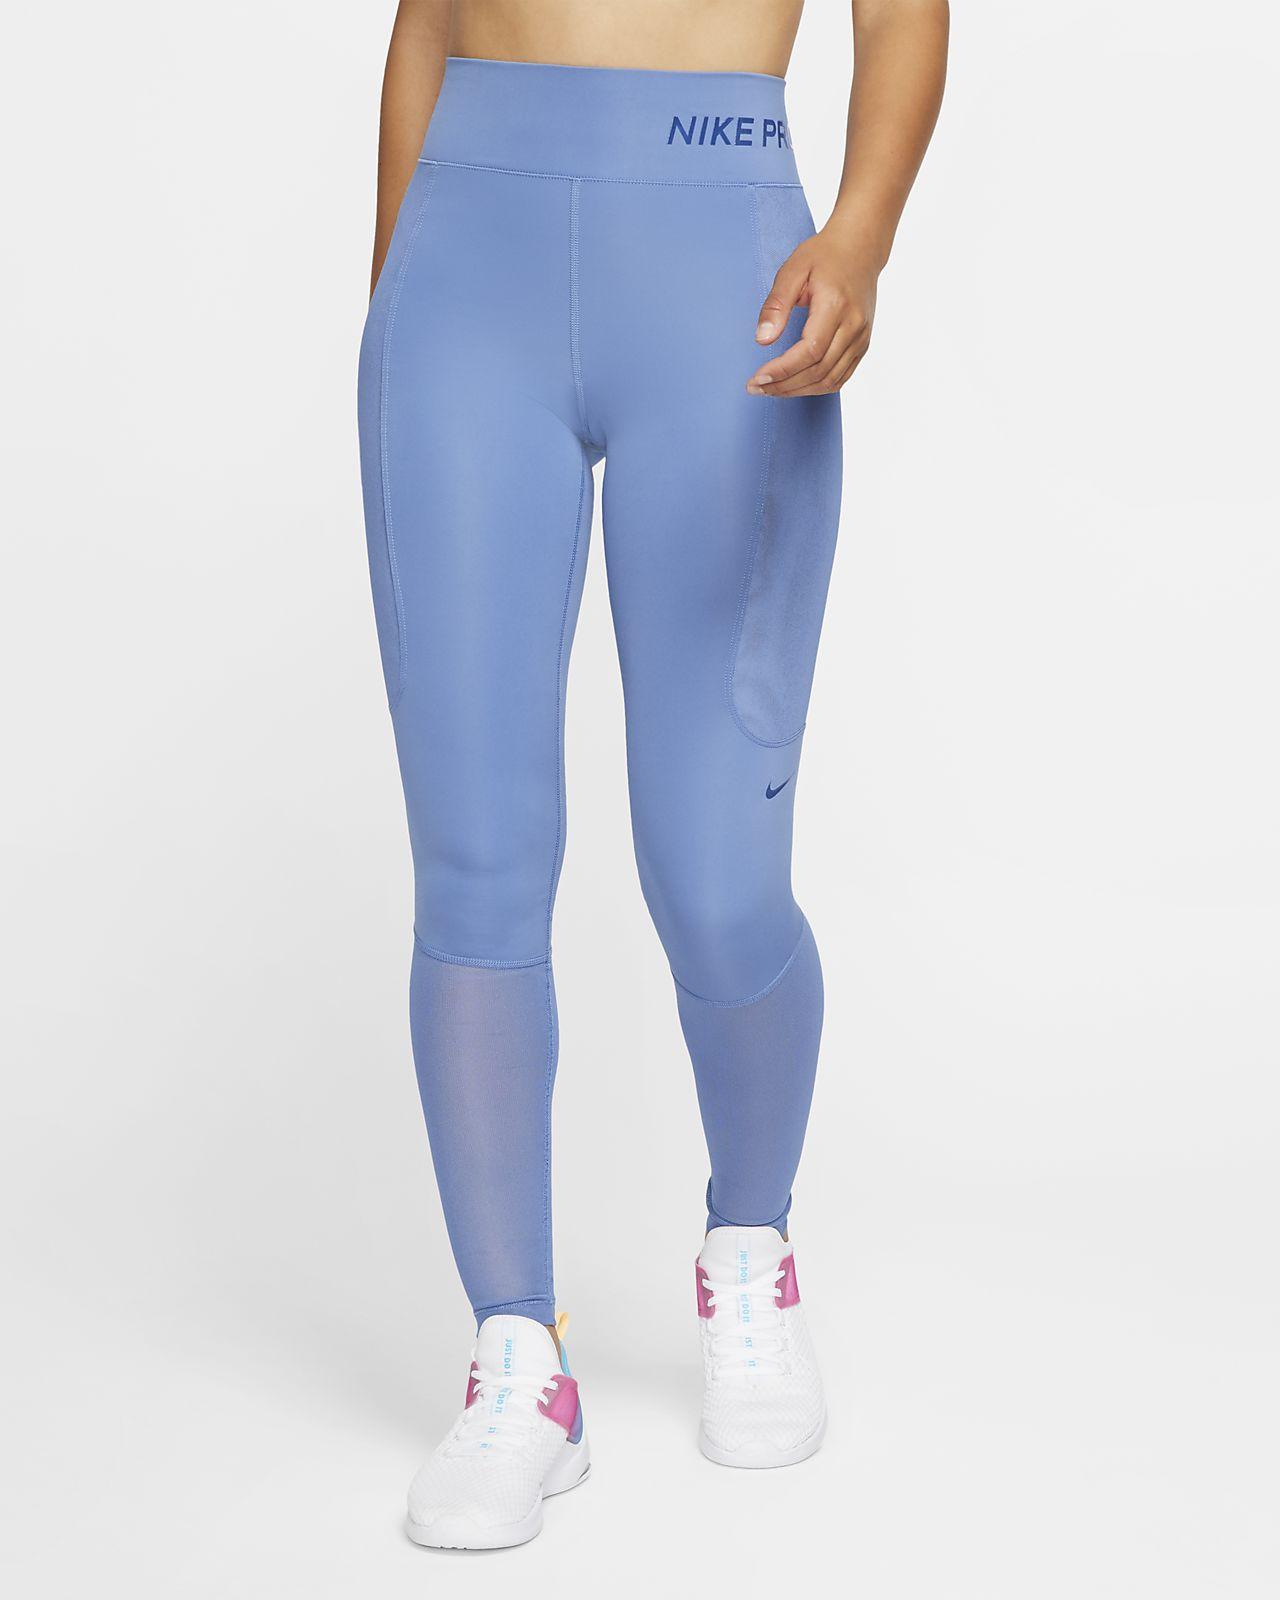 da65744113 Nike Pro HyperCool női testhezálló nadrág. Nike.com HU